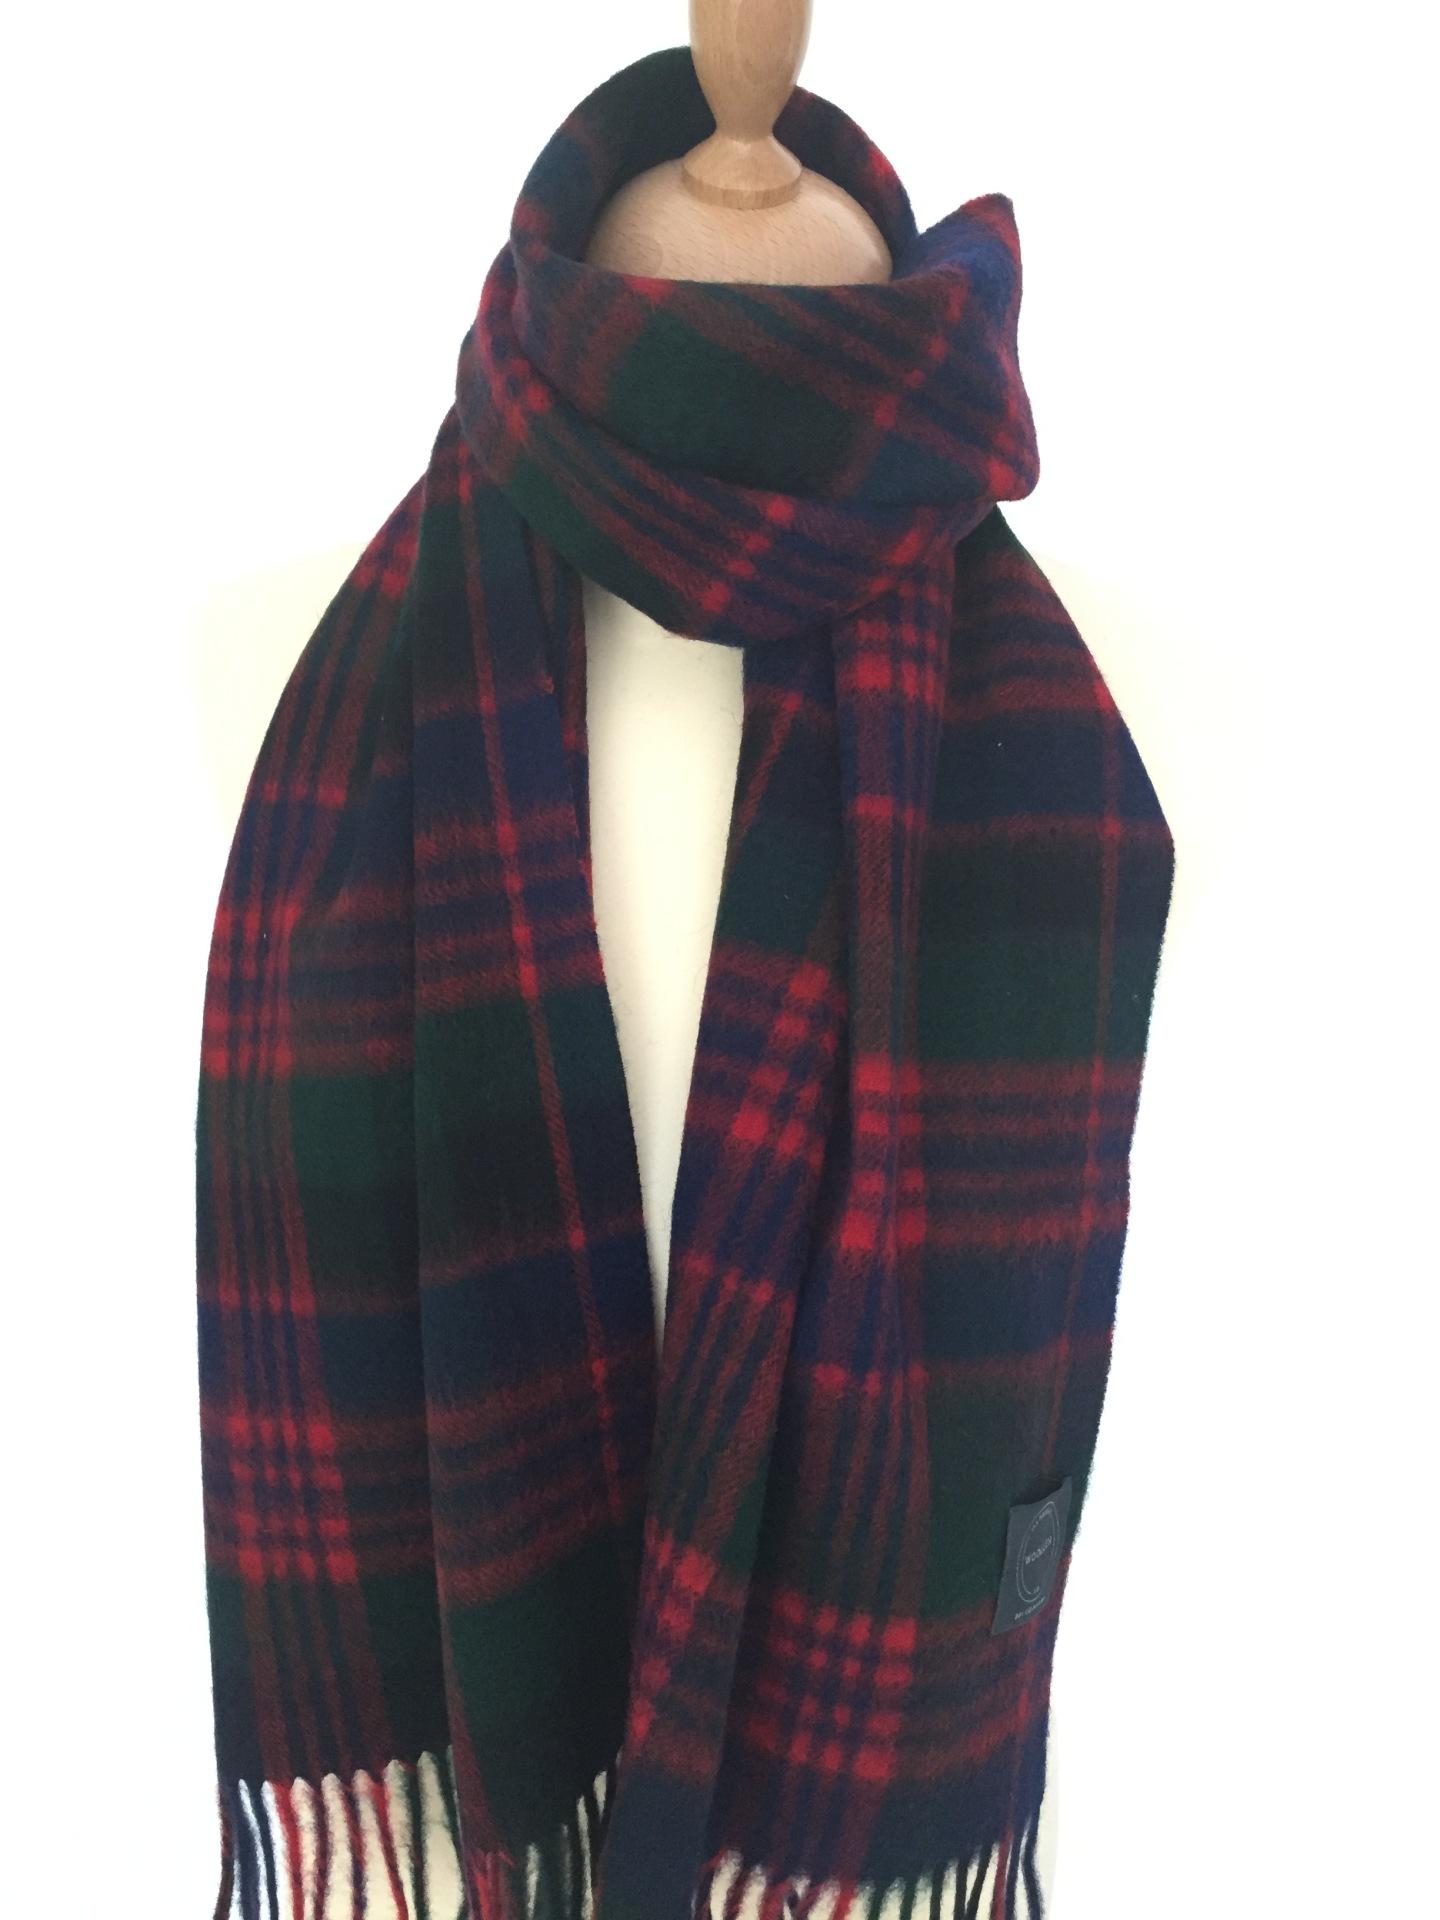 Macdonald Tartan  Lambswool scarf